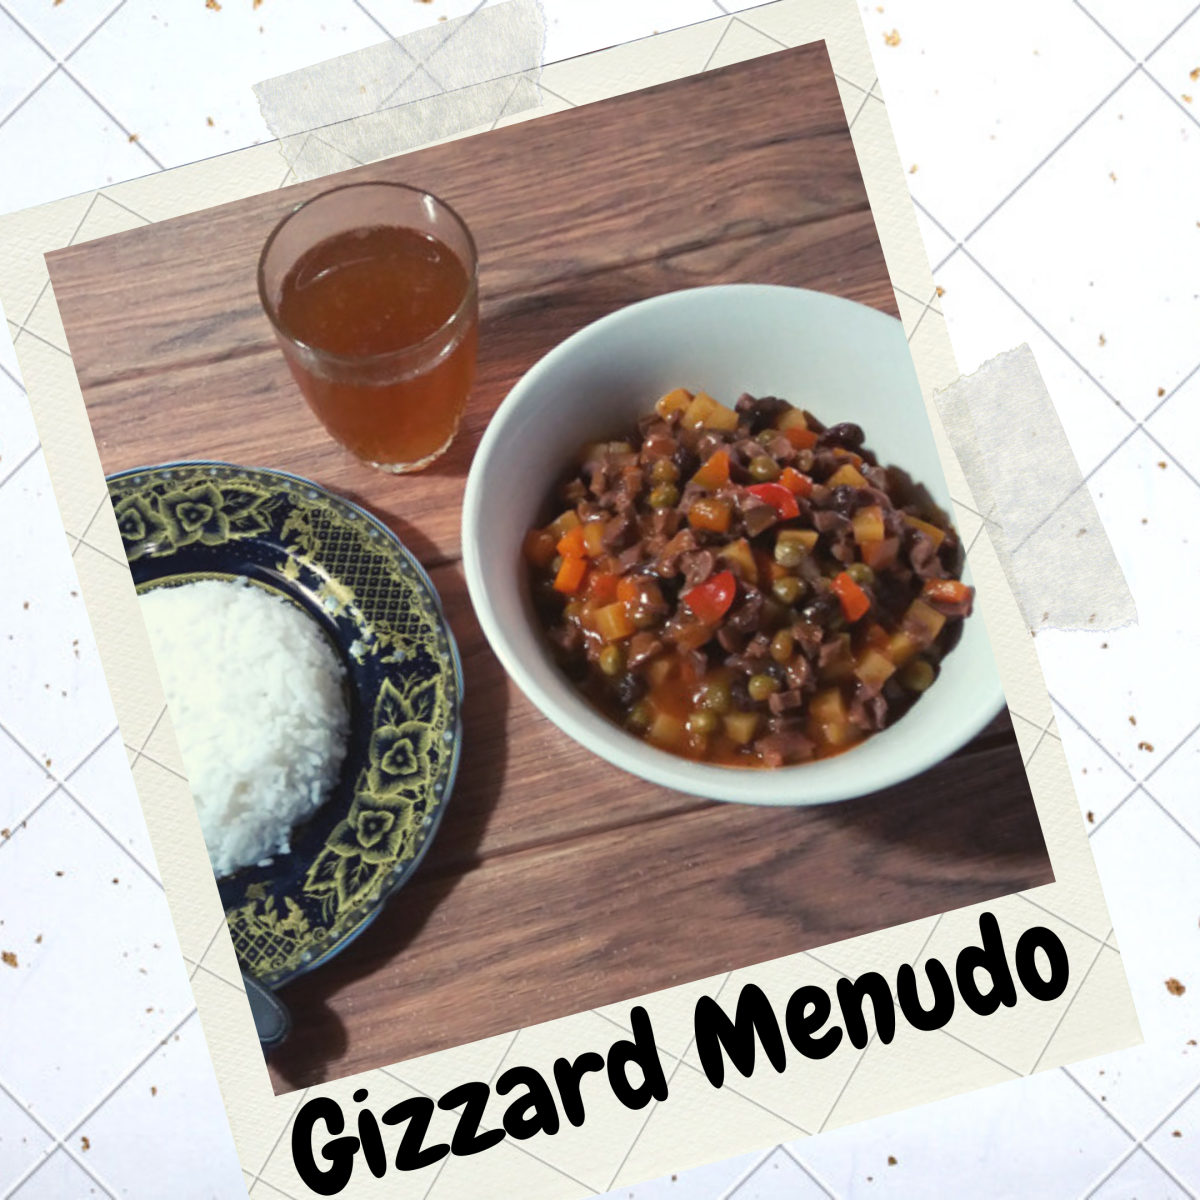 Easy gizzard menudo recipe